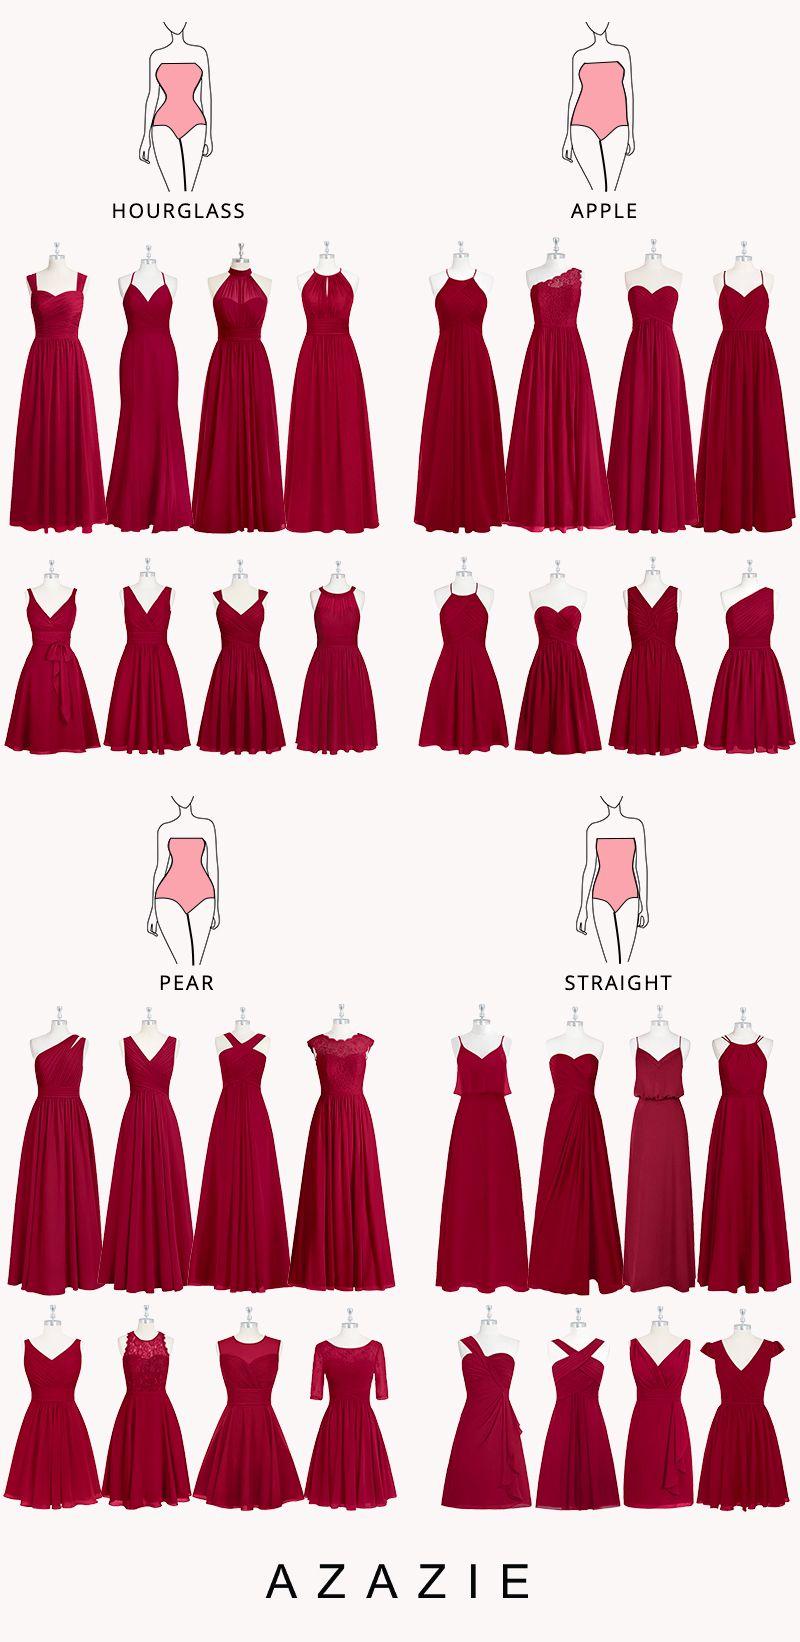 Burgundy Bridesmaid Dresses At Affordable Prices In 2020 Burgundy Bridesmaid Dresses Red Bridesmaid Dresses Burgundy Bridesmaid